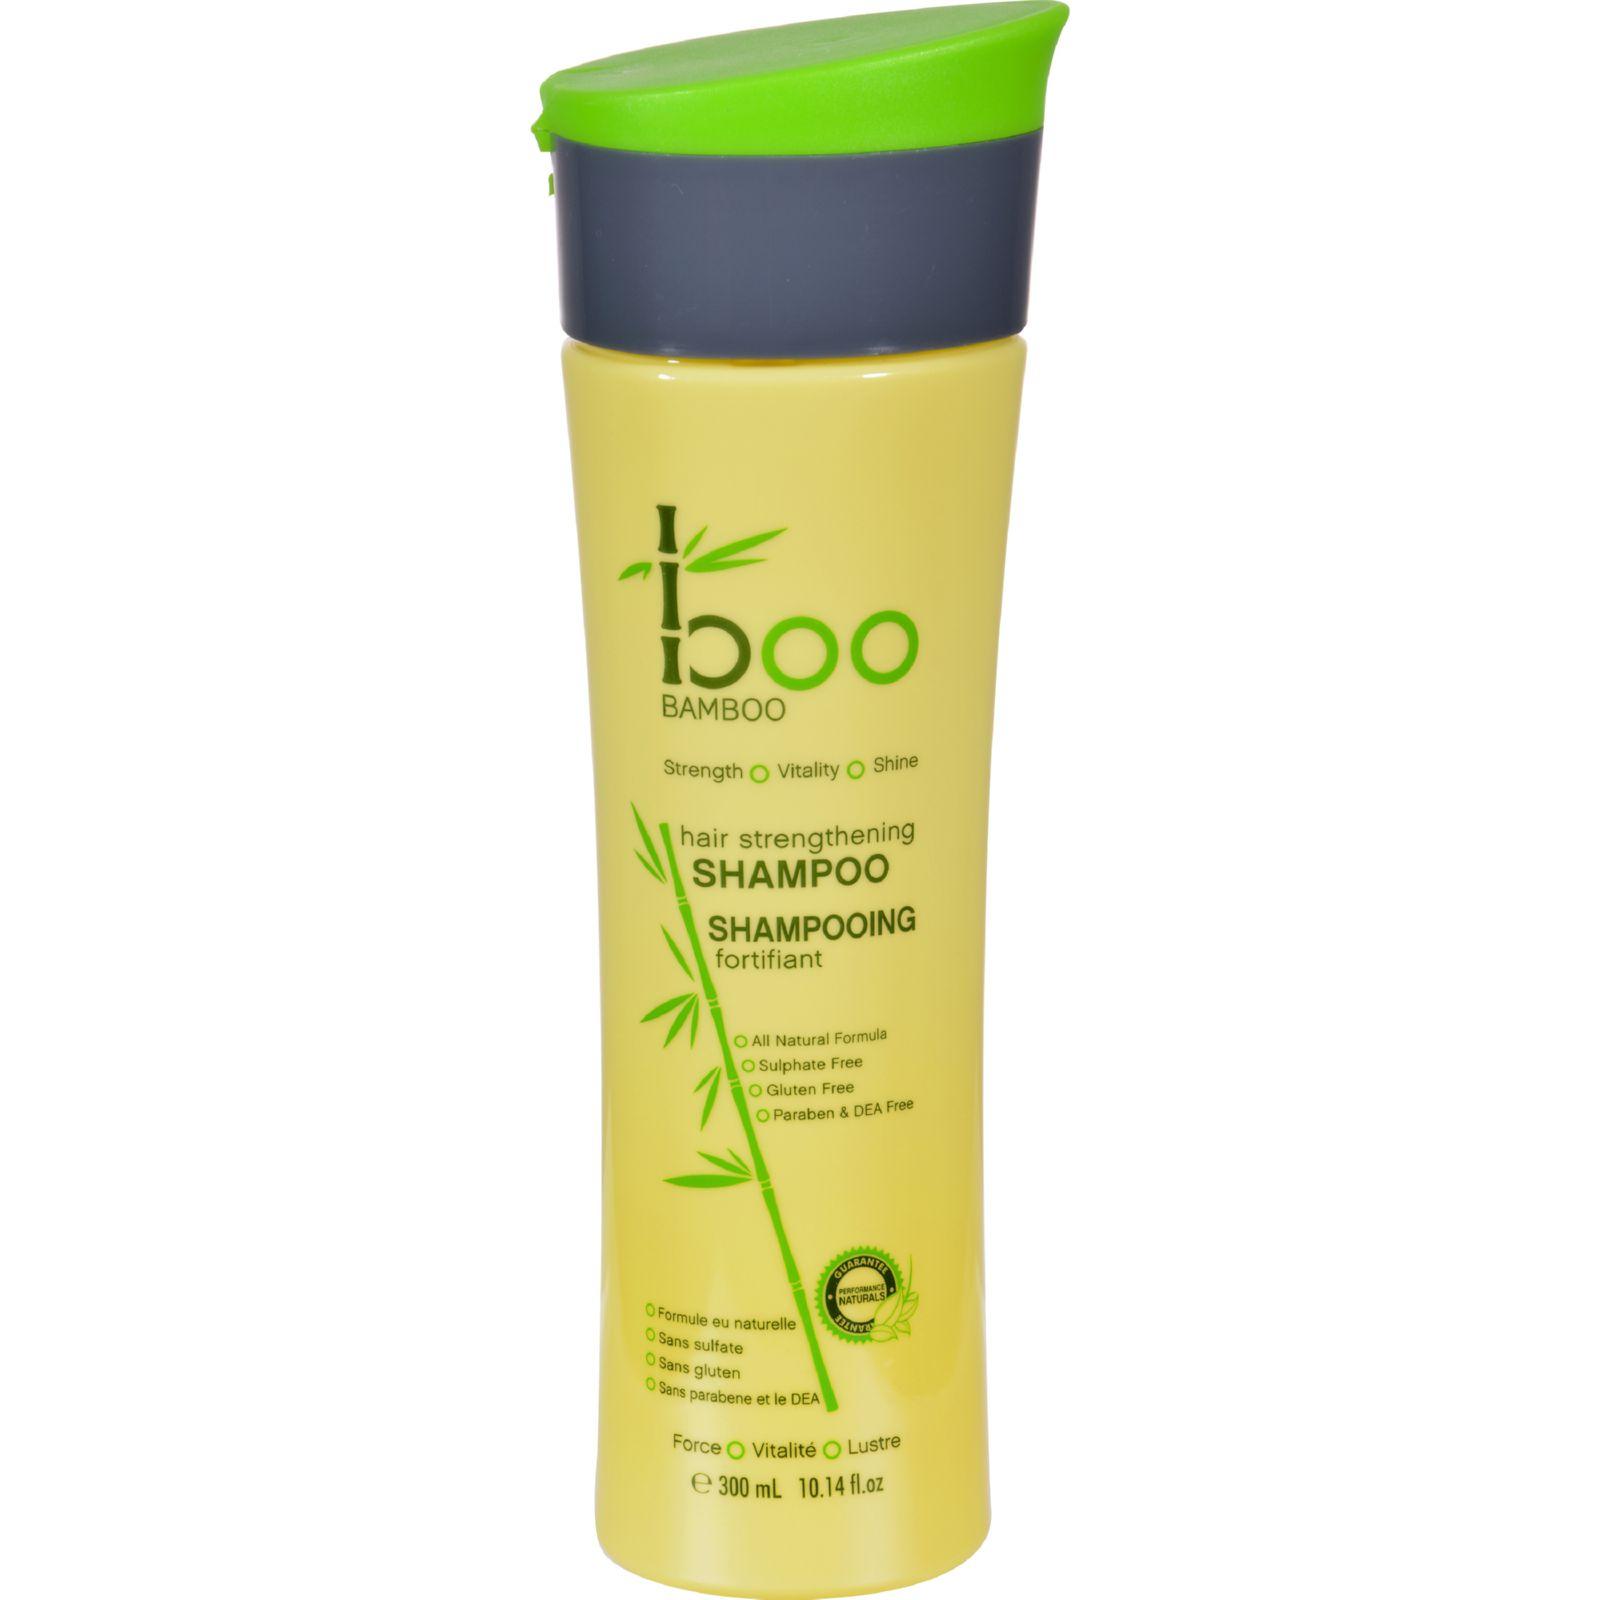 Boo Bamboo Shampoo - Strengthening - 10.14 oz